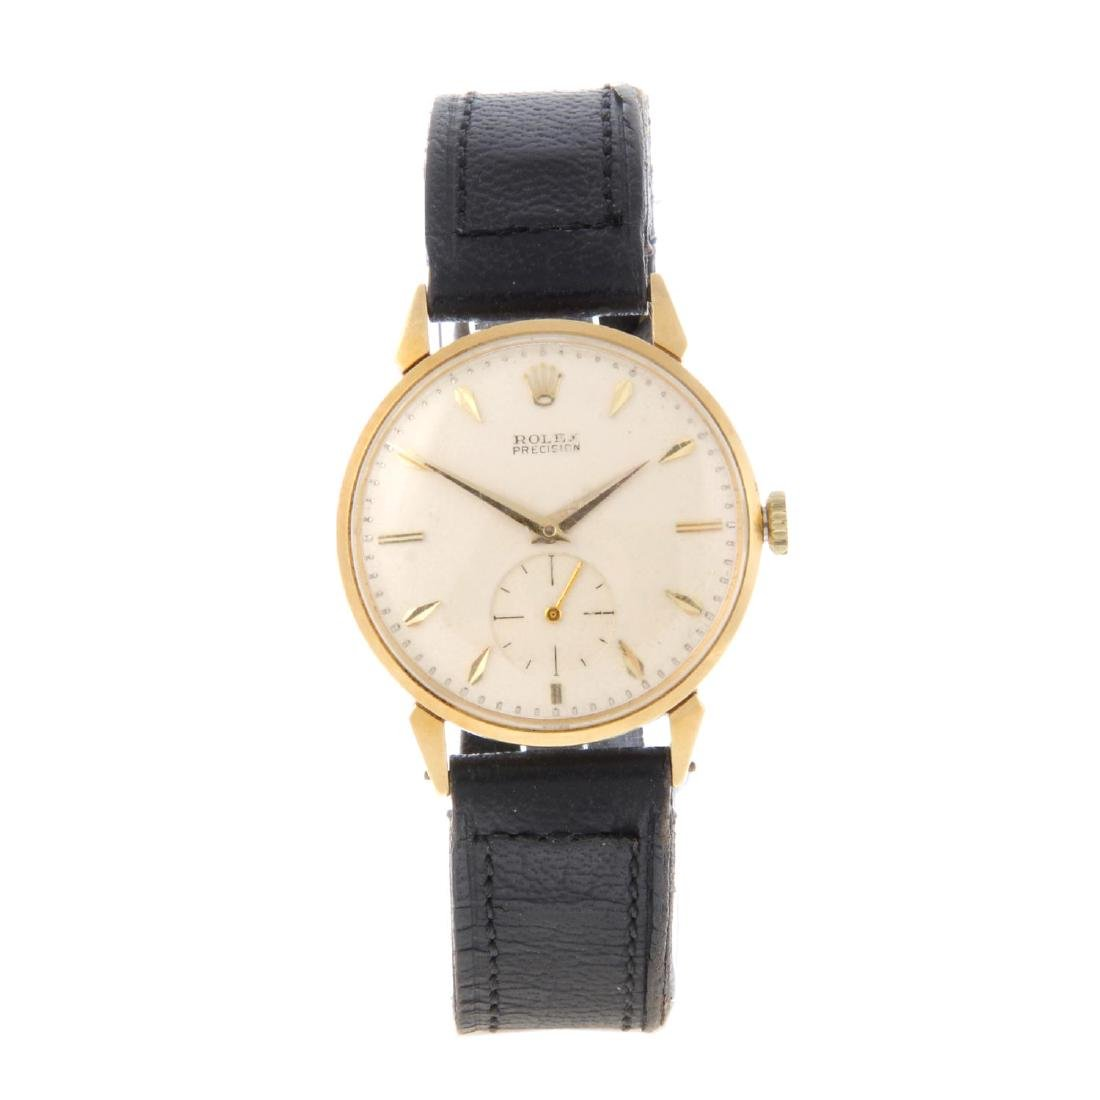 ROLEX - a gentleman's Precision wrist watch. 18ct